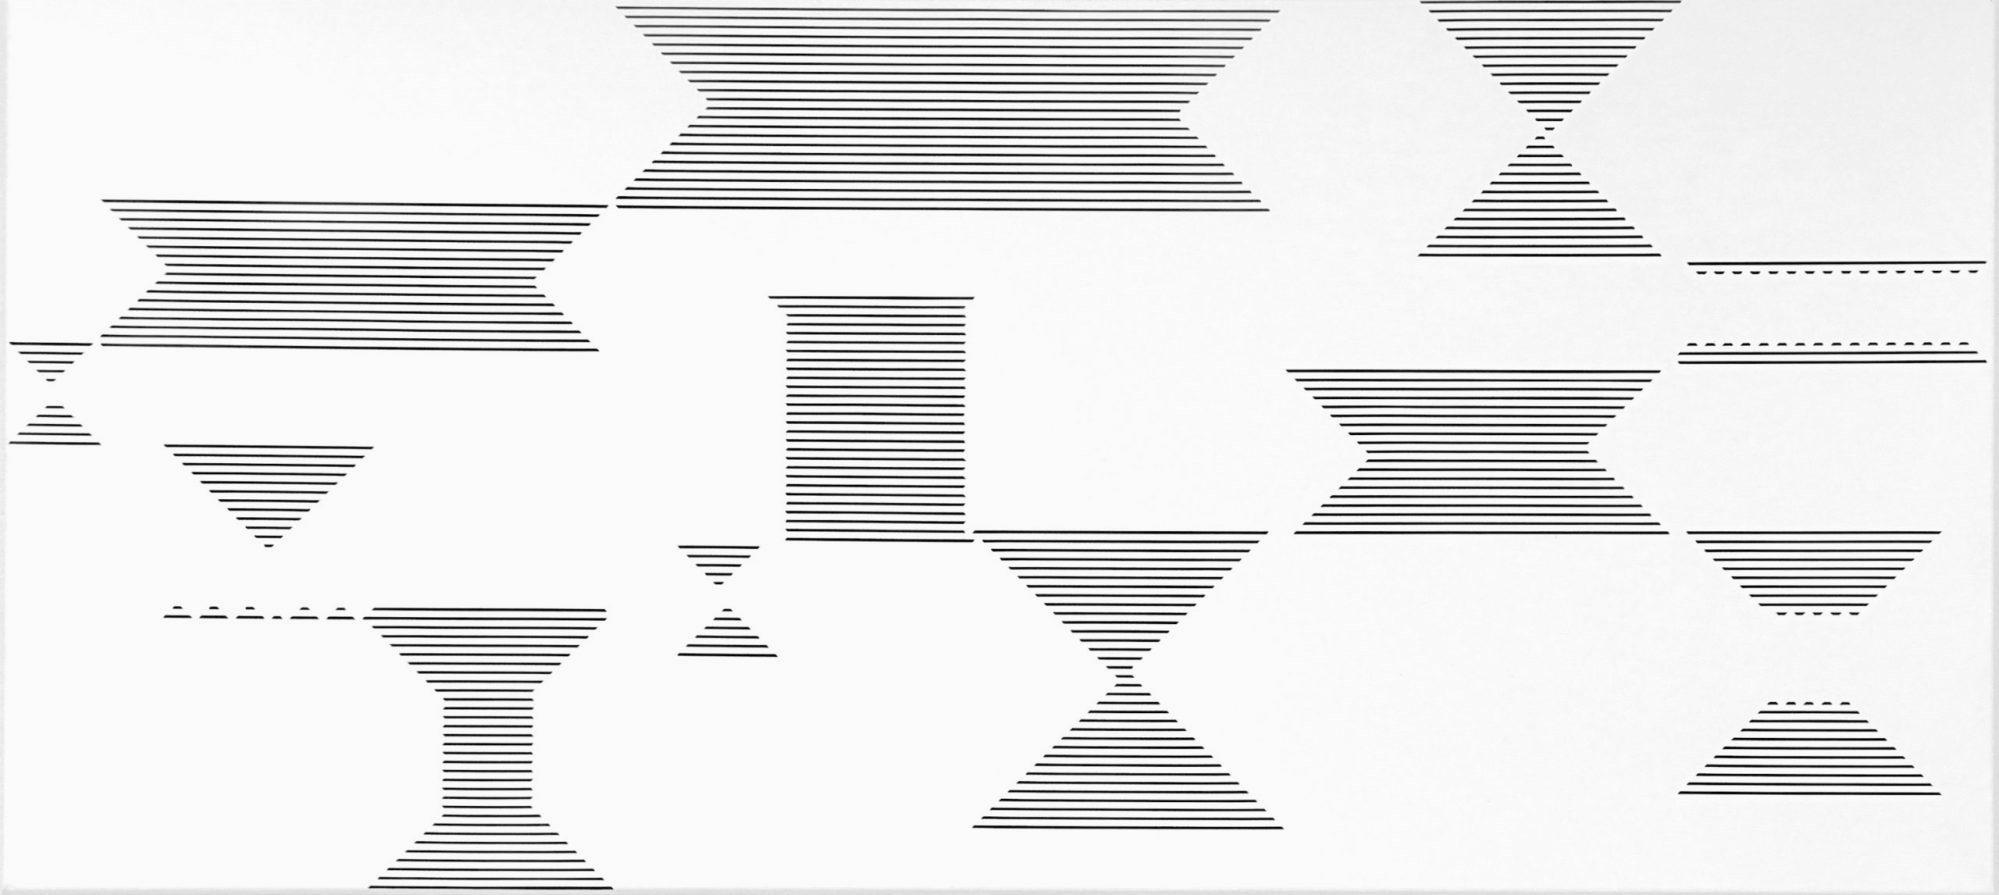 Vera Molnar, Ligne Scindee, Acryl auf Leinwand, 50 x 110 cm, 2014